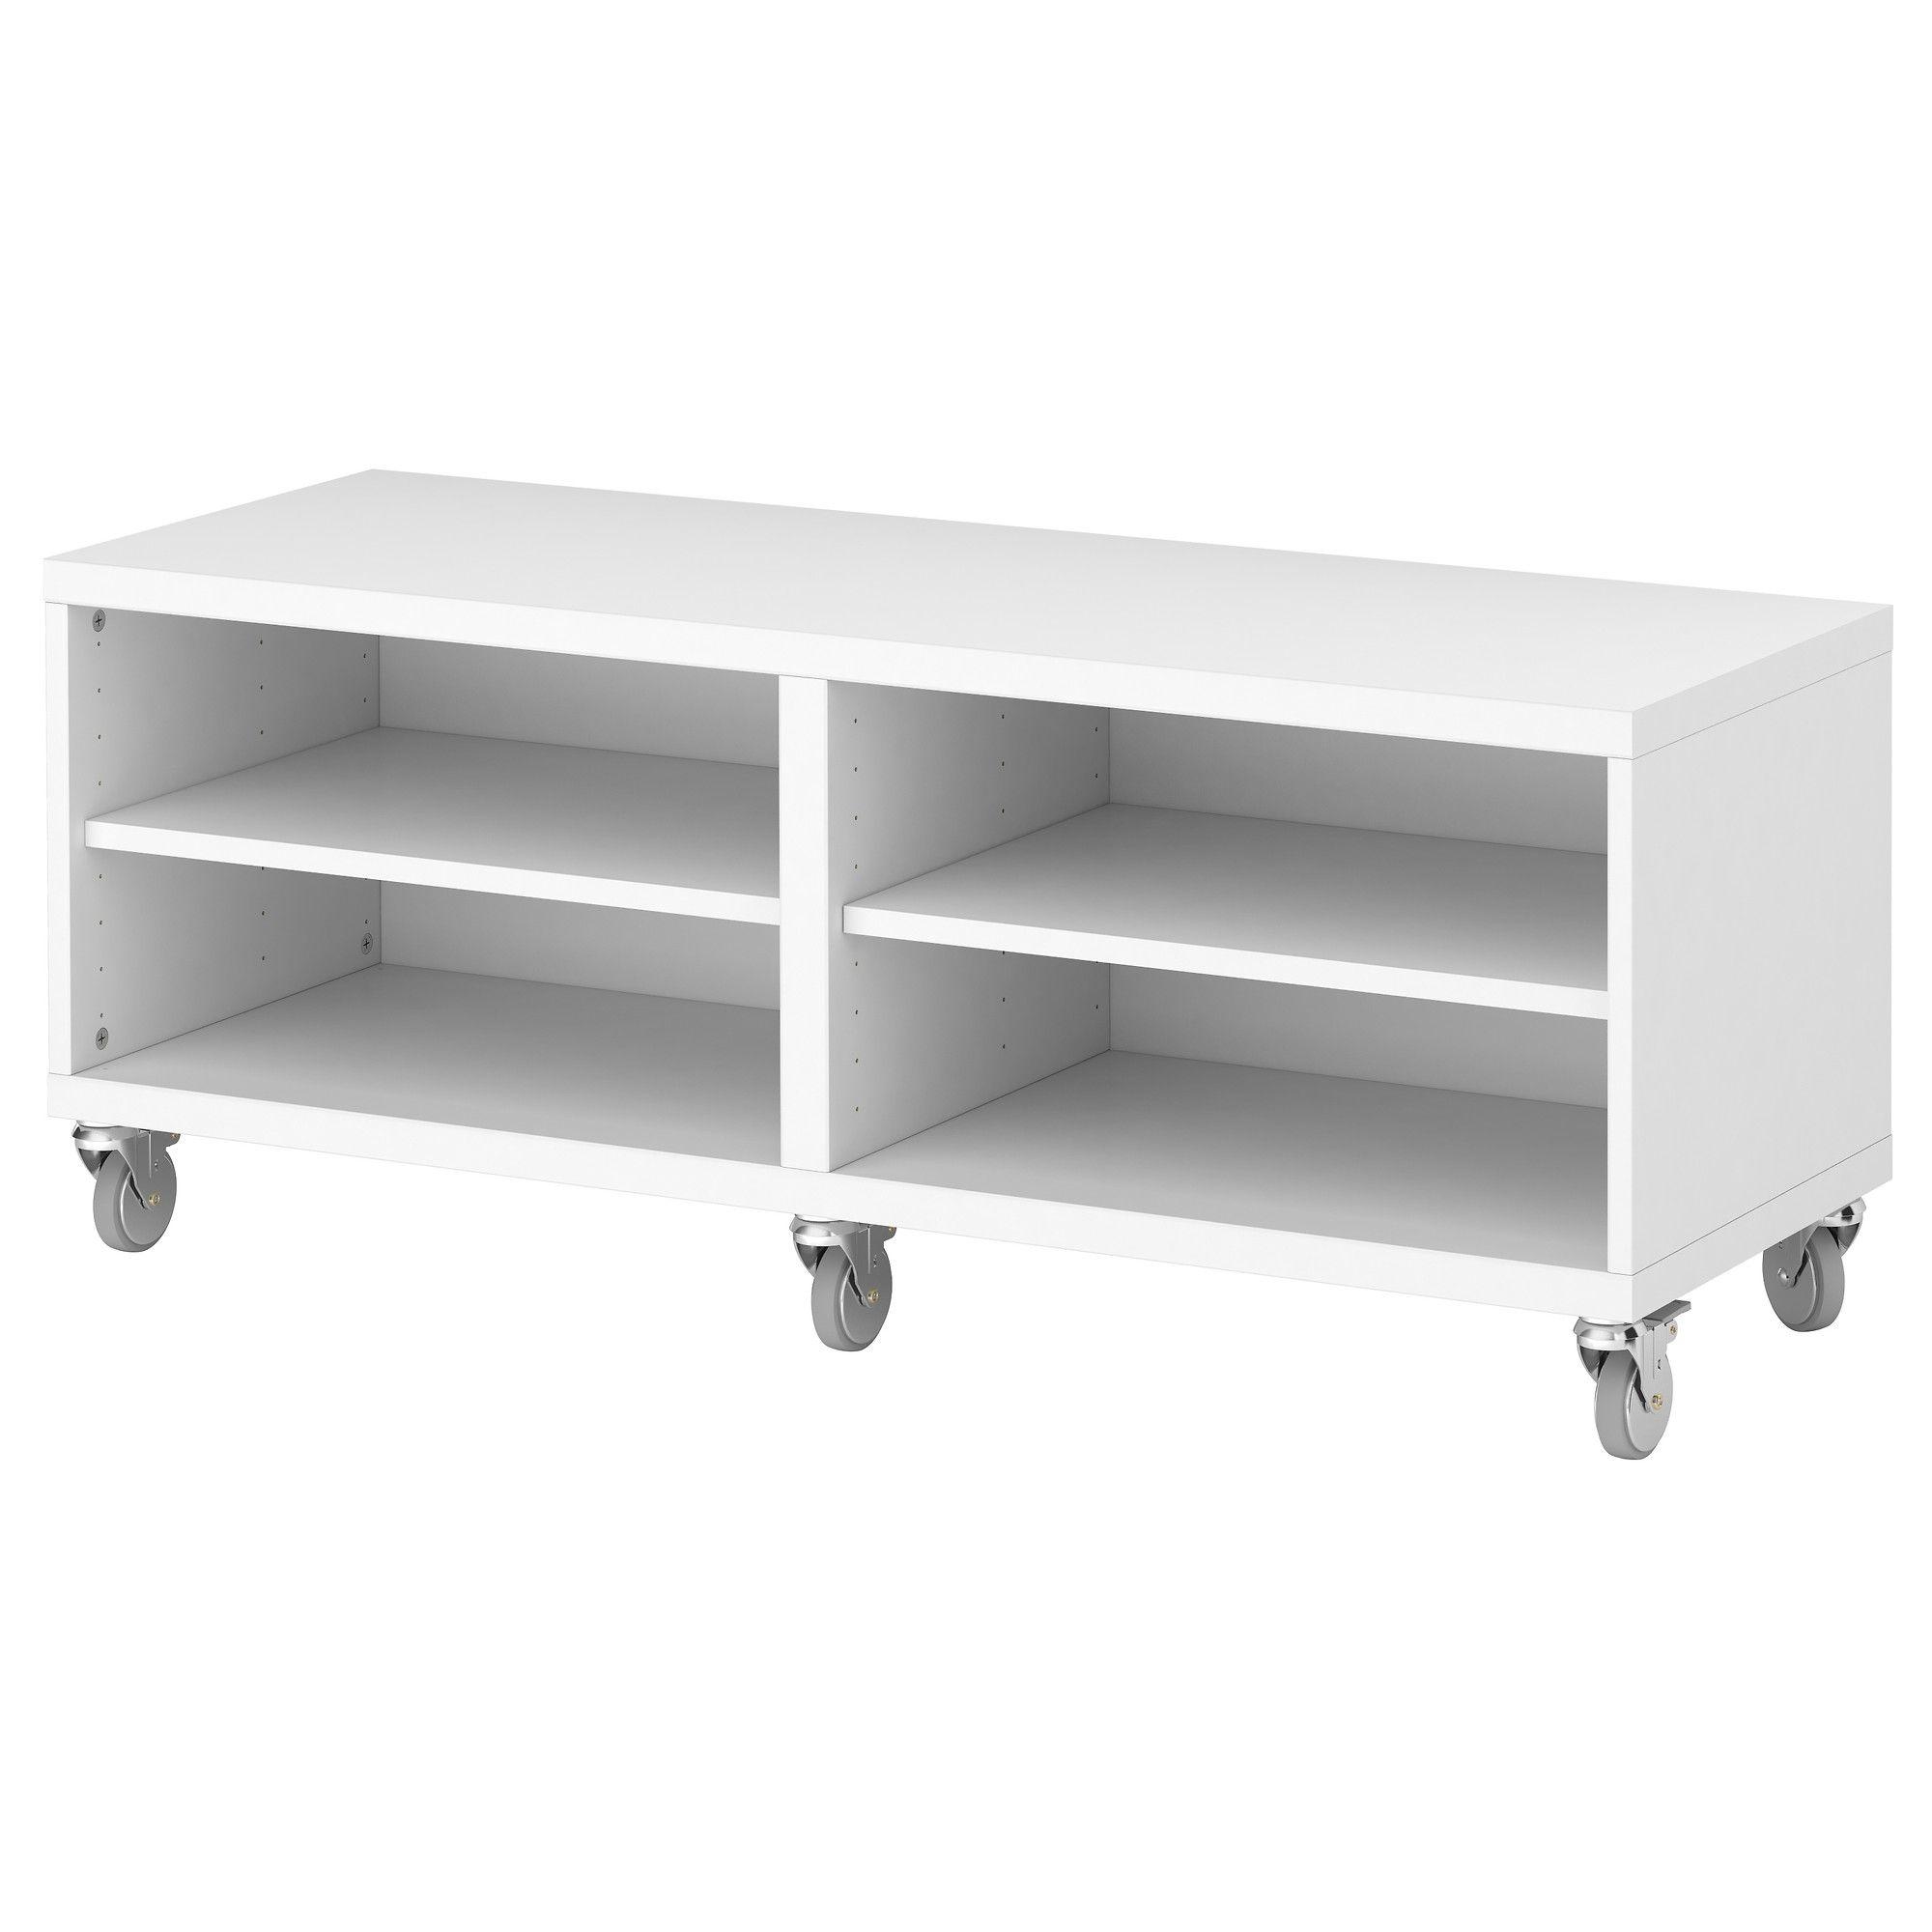 ikea sofa with wheels pauline parmentier sofascore bestÅ bench casters white organize